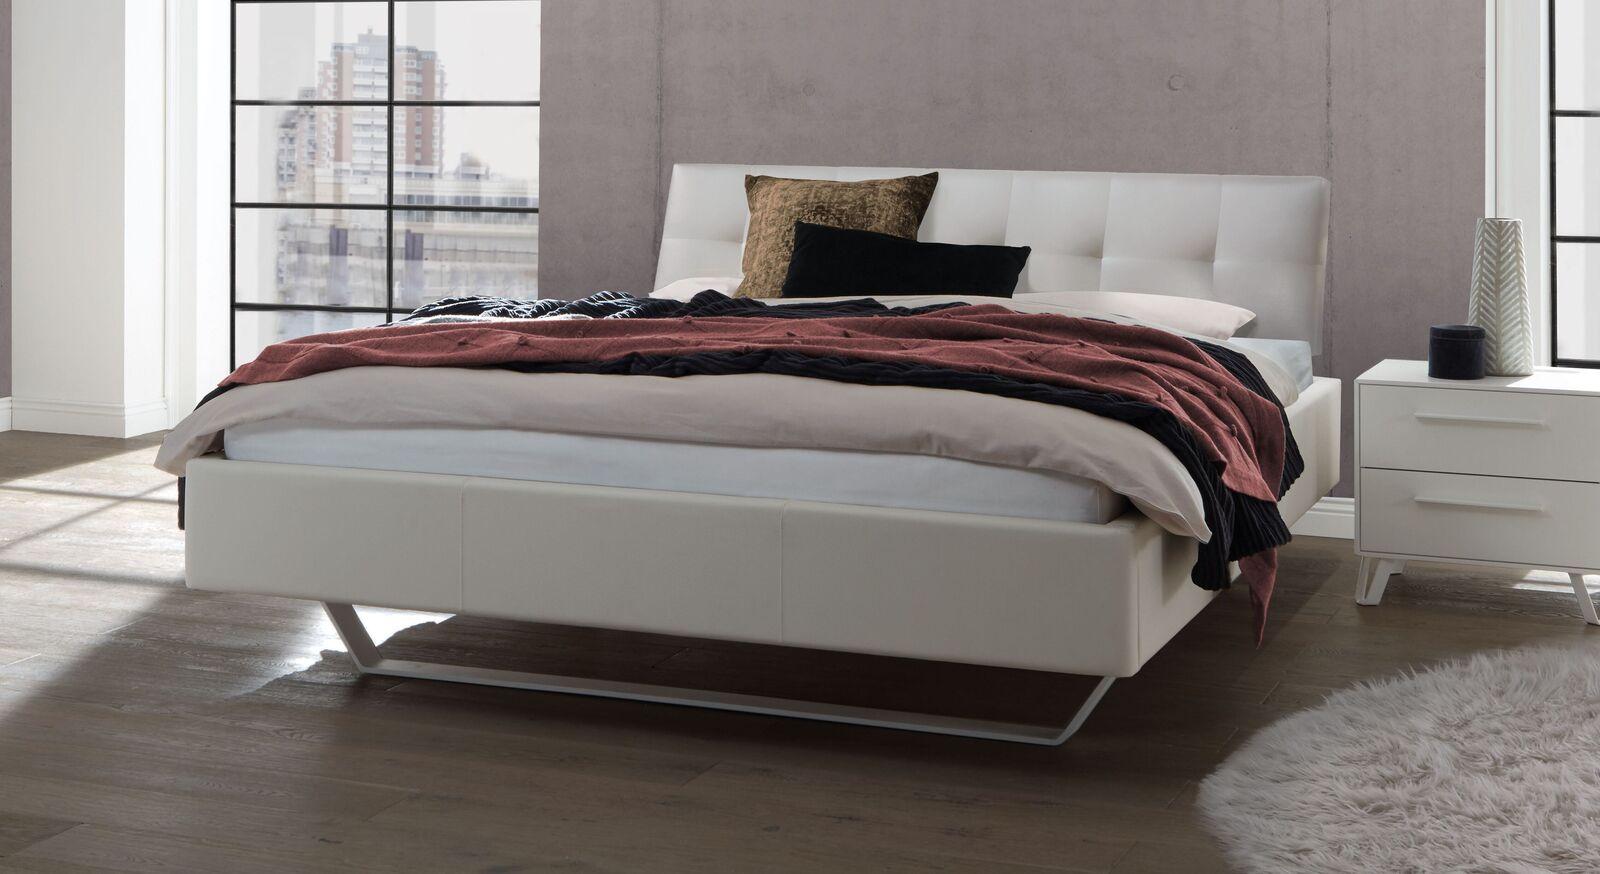 Bett Liene aus Echtleder in Kalk